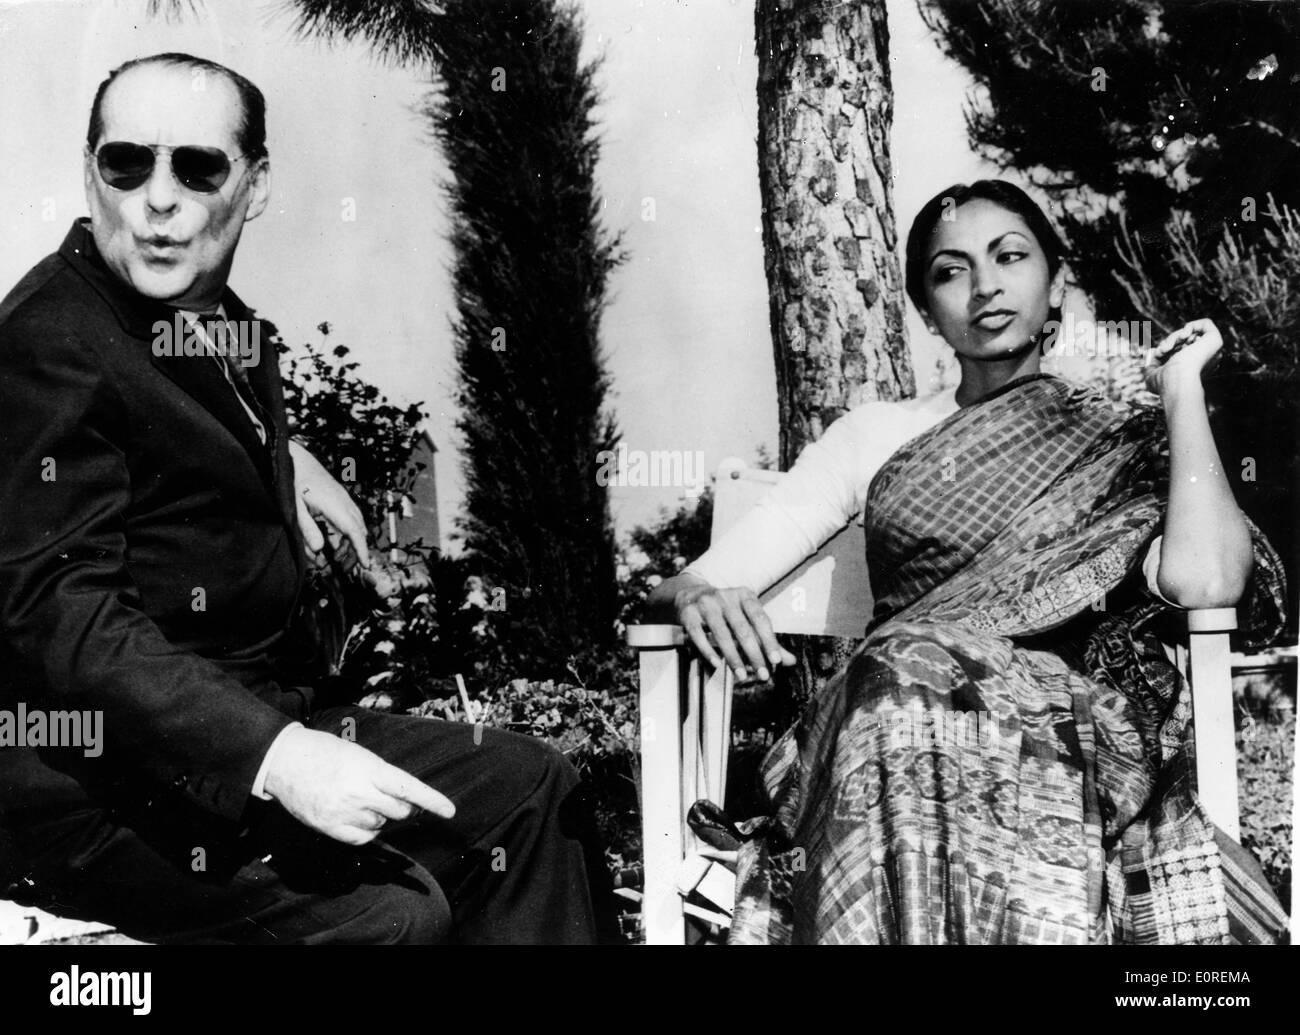 Director Roberto Rossellini seated with his wife Sonali Das Gupta - Stock Image